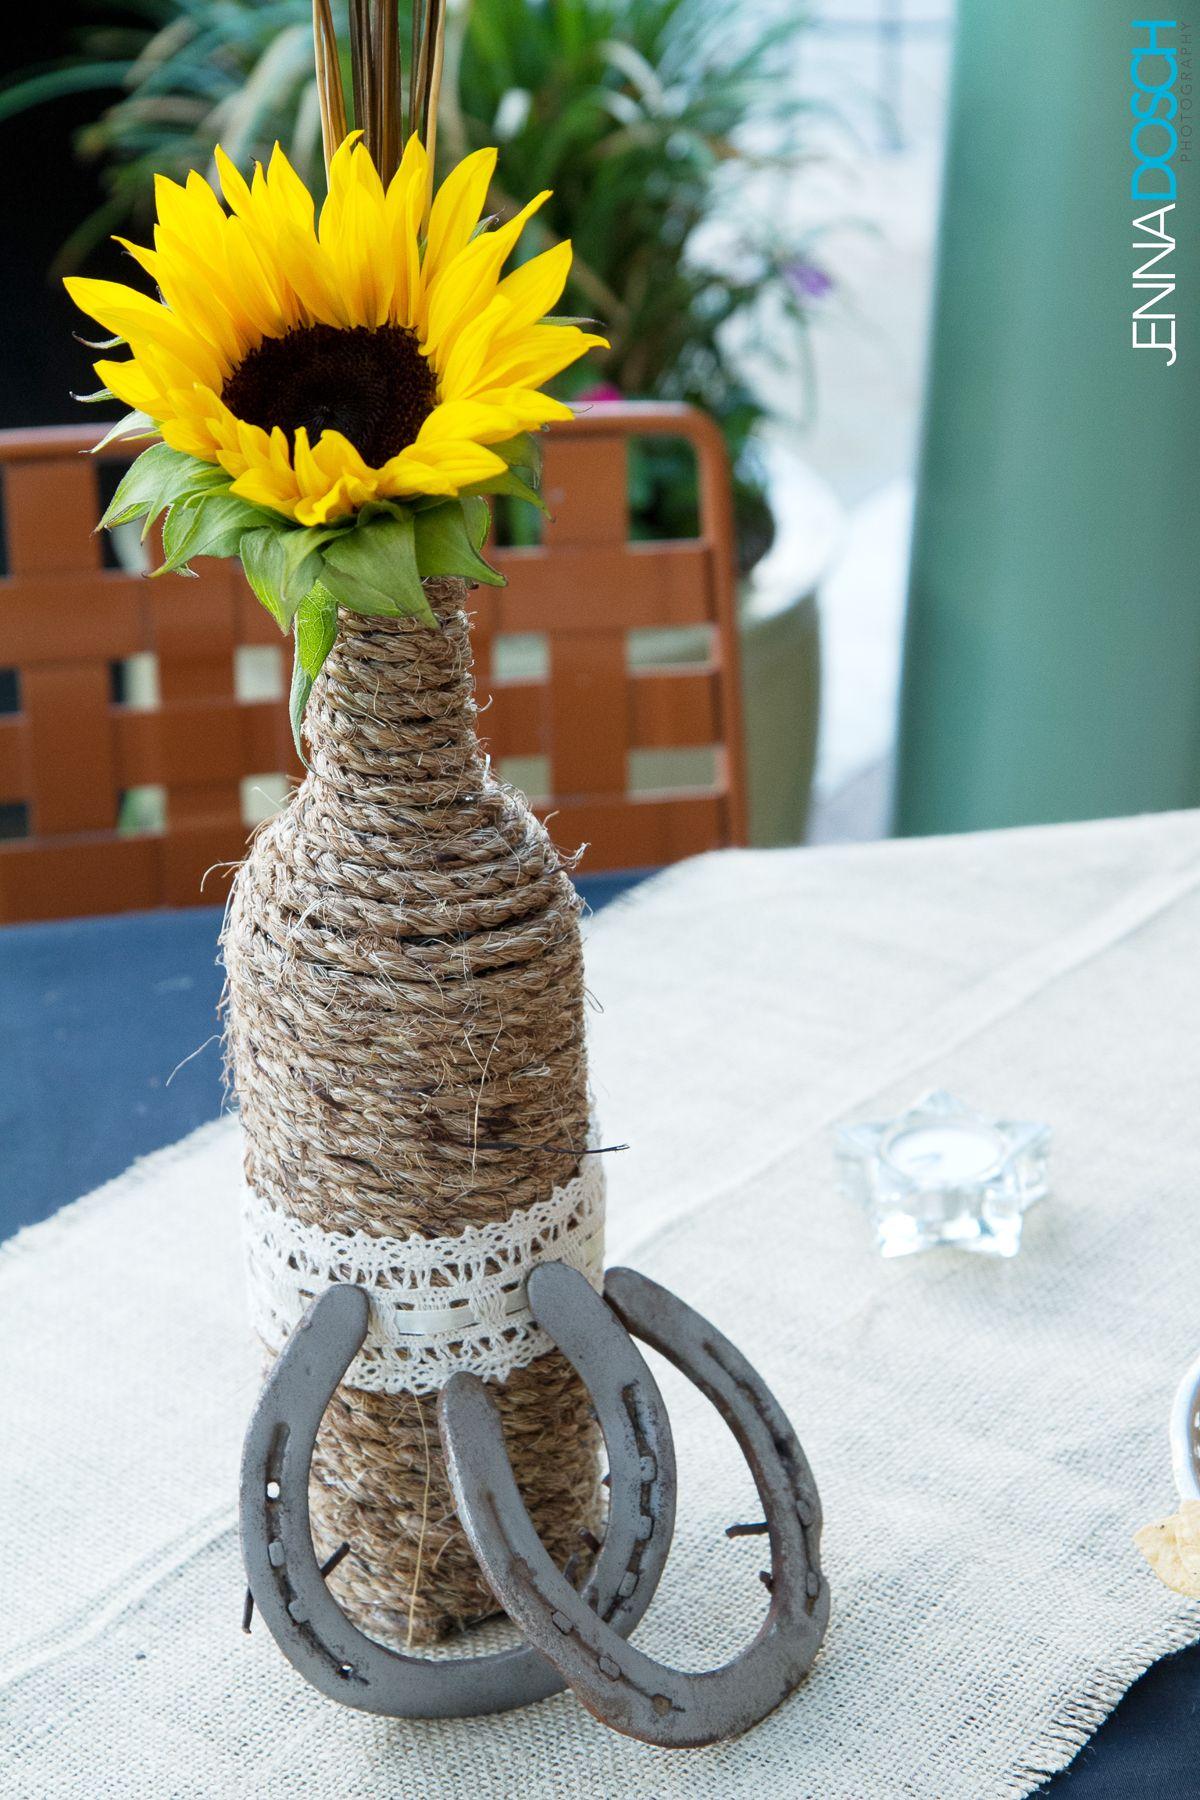 25 creative floral designs with sunflowers sunny summer table decoration ideas western wedding centerpiecessunflower